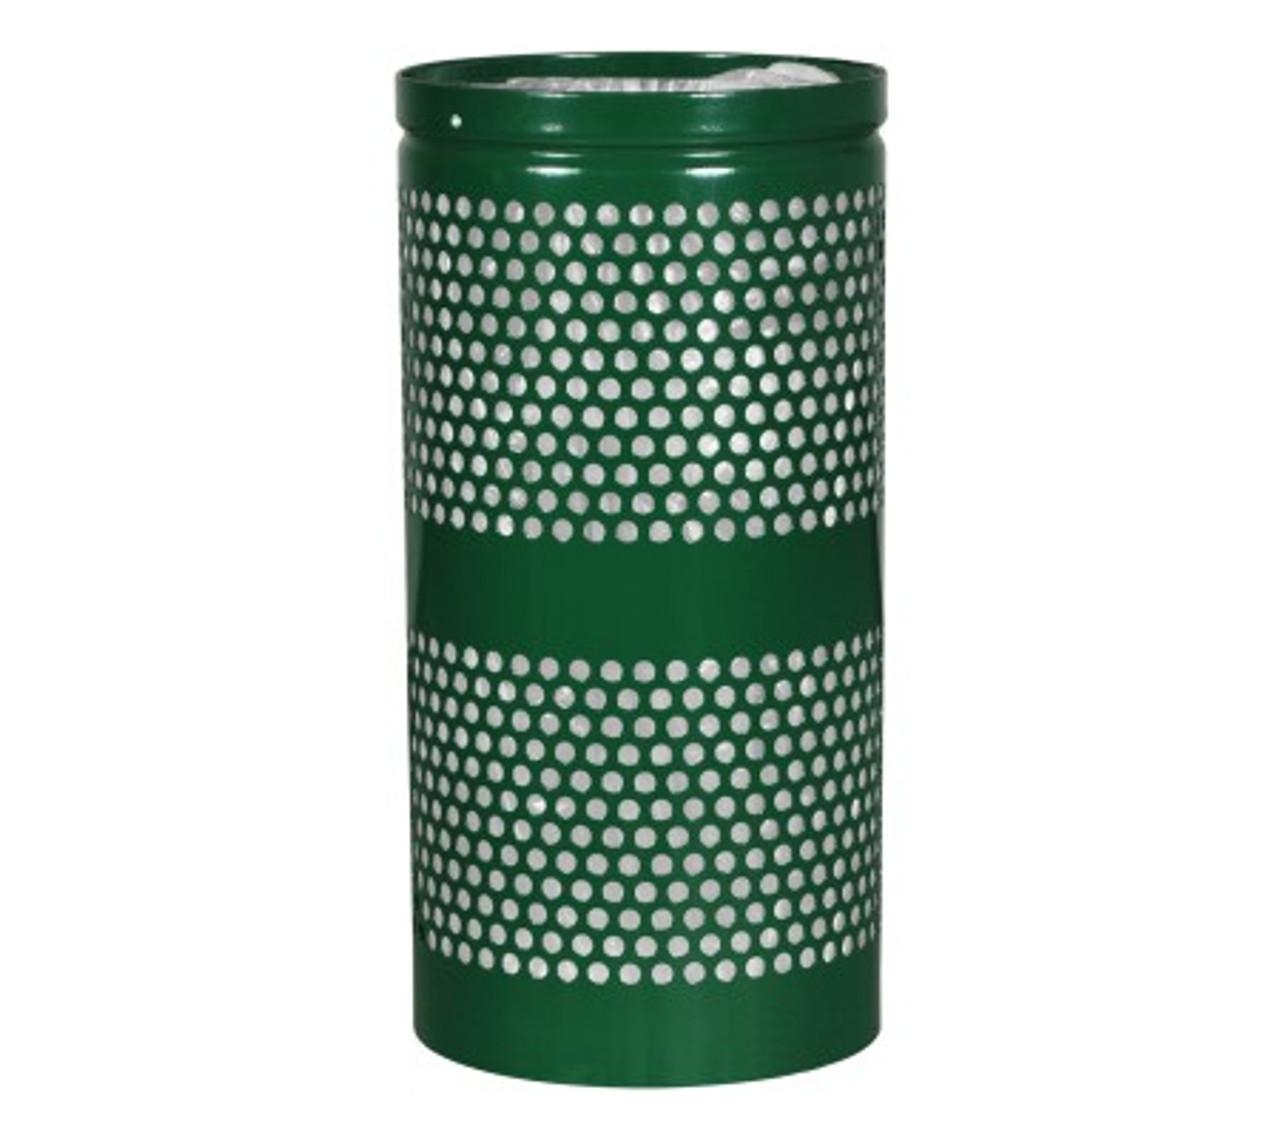 10 Gallon Mesh Trash Can WR-10R HGR GREEN GLOSS with Anchor Kit